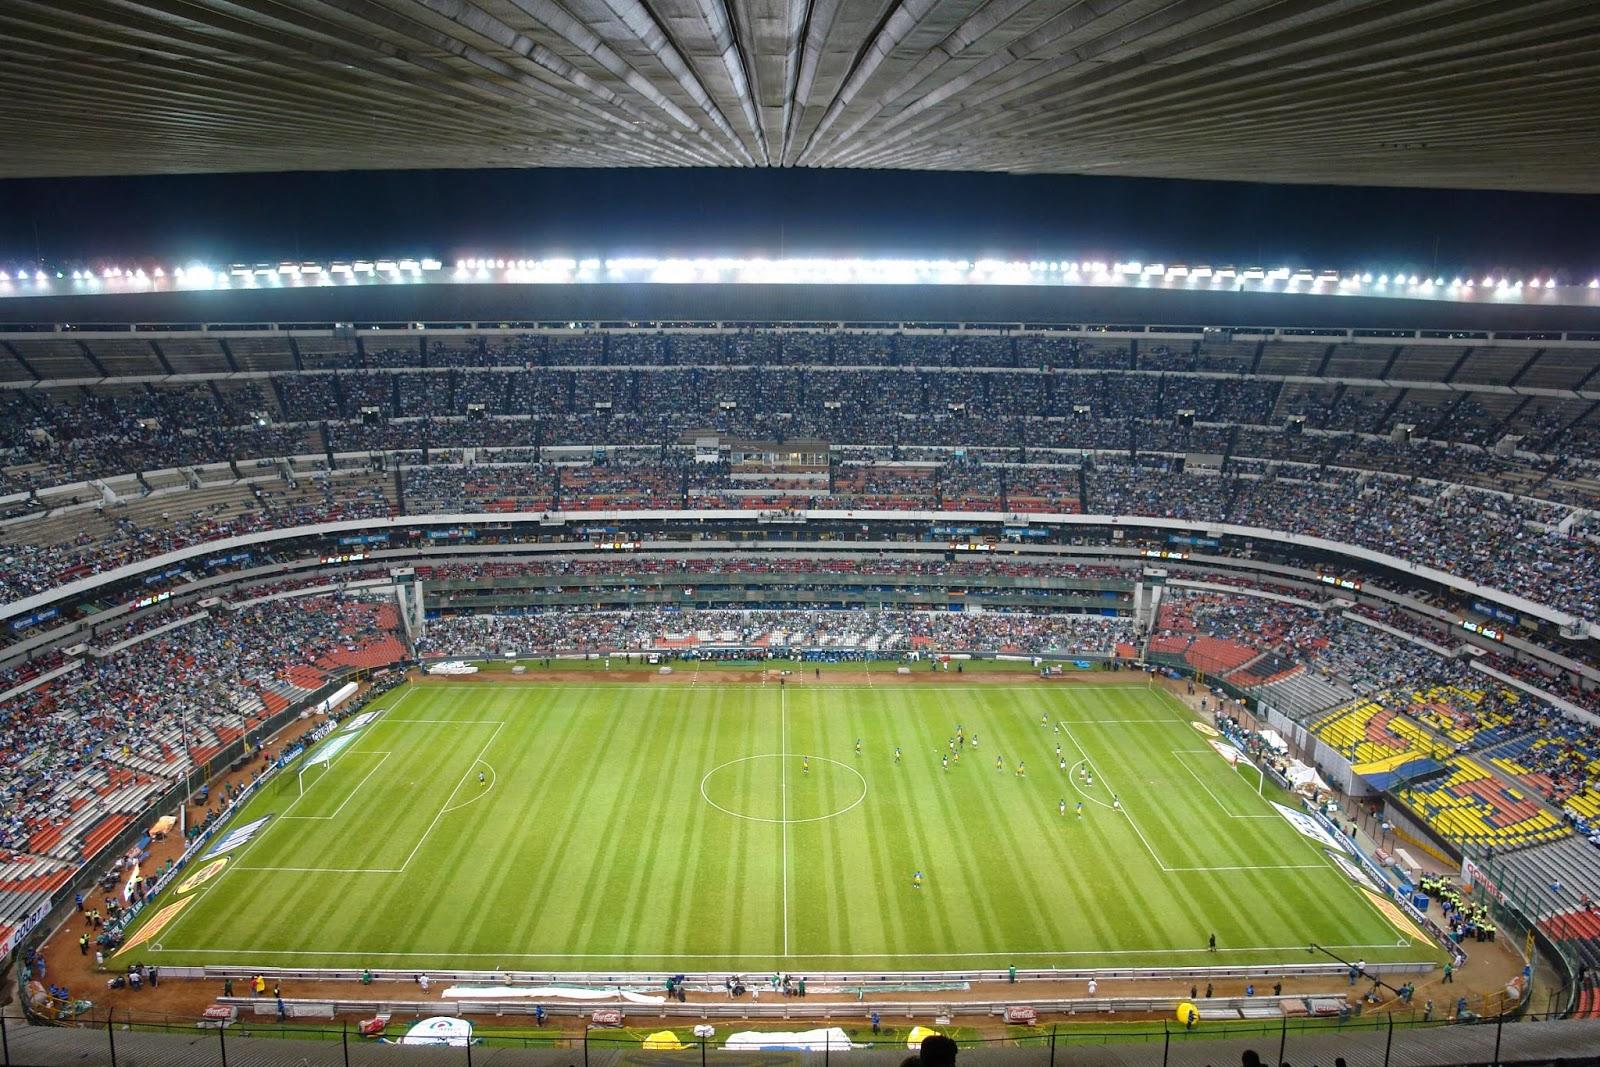 Top 10 football stadiums new hd wallpapers 2014 2015 - Soccer stadium hd ...